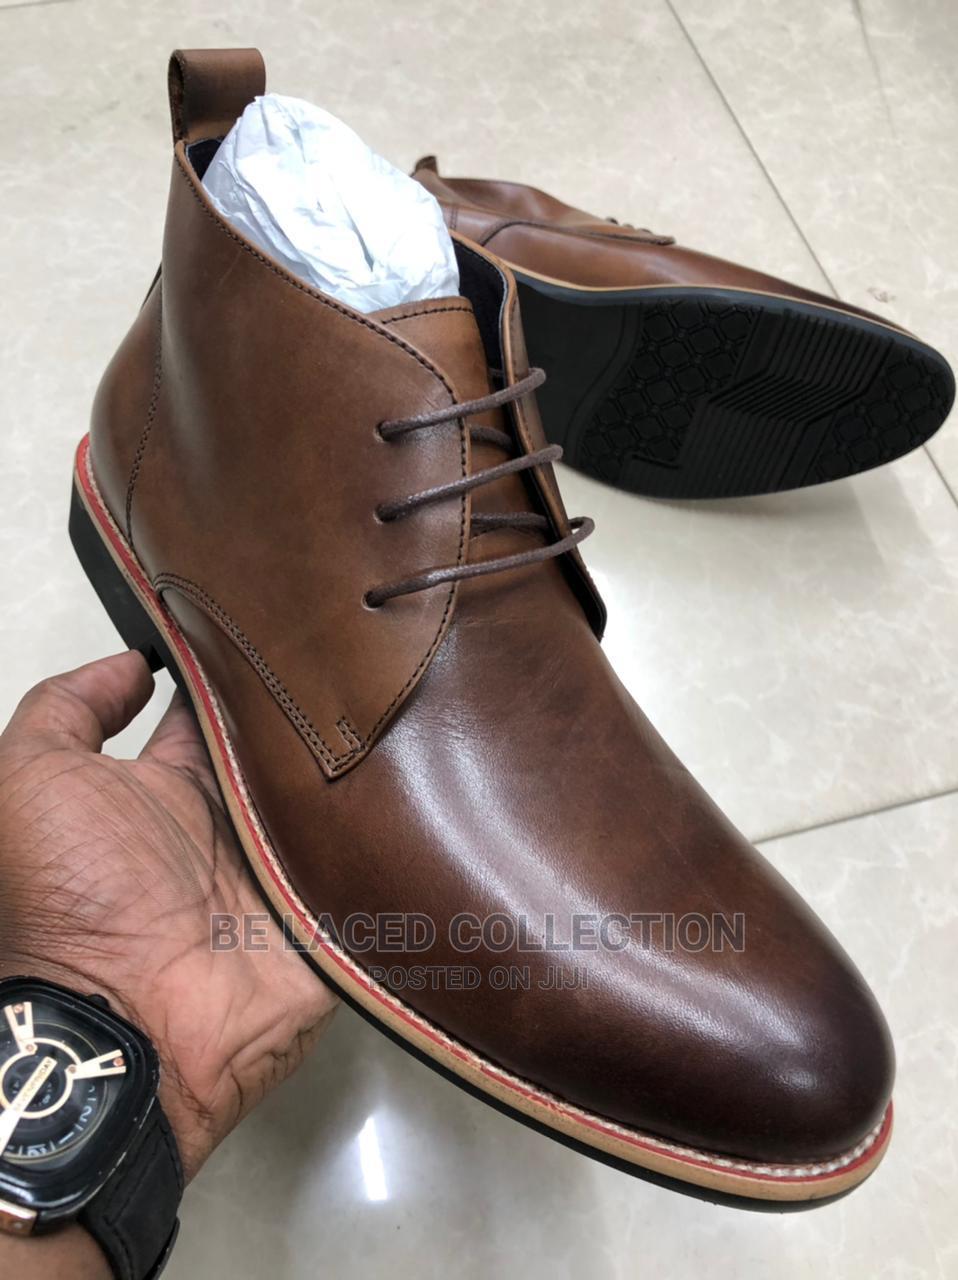 Chelsea Boots.   Shoes for sale in Kilimani, Nairobi, Kenya